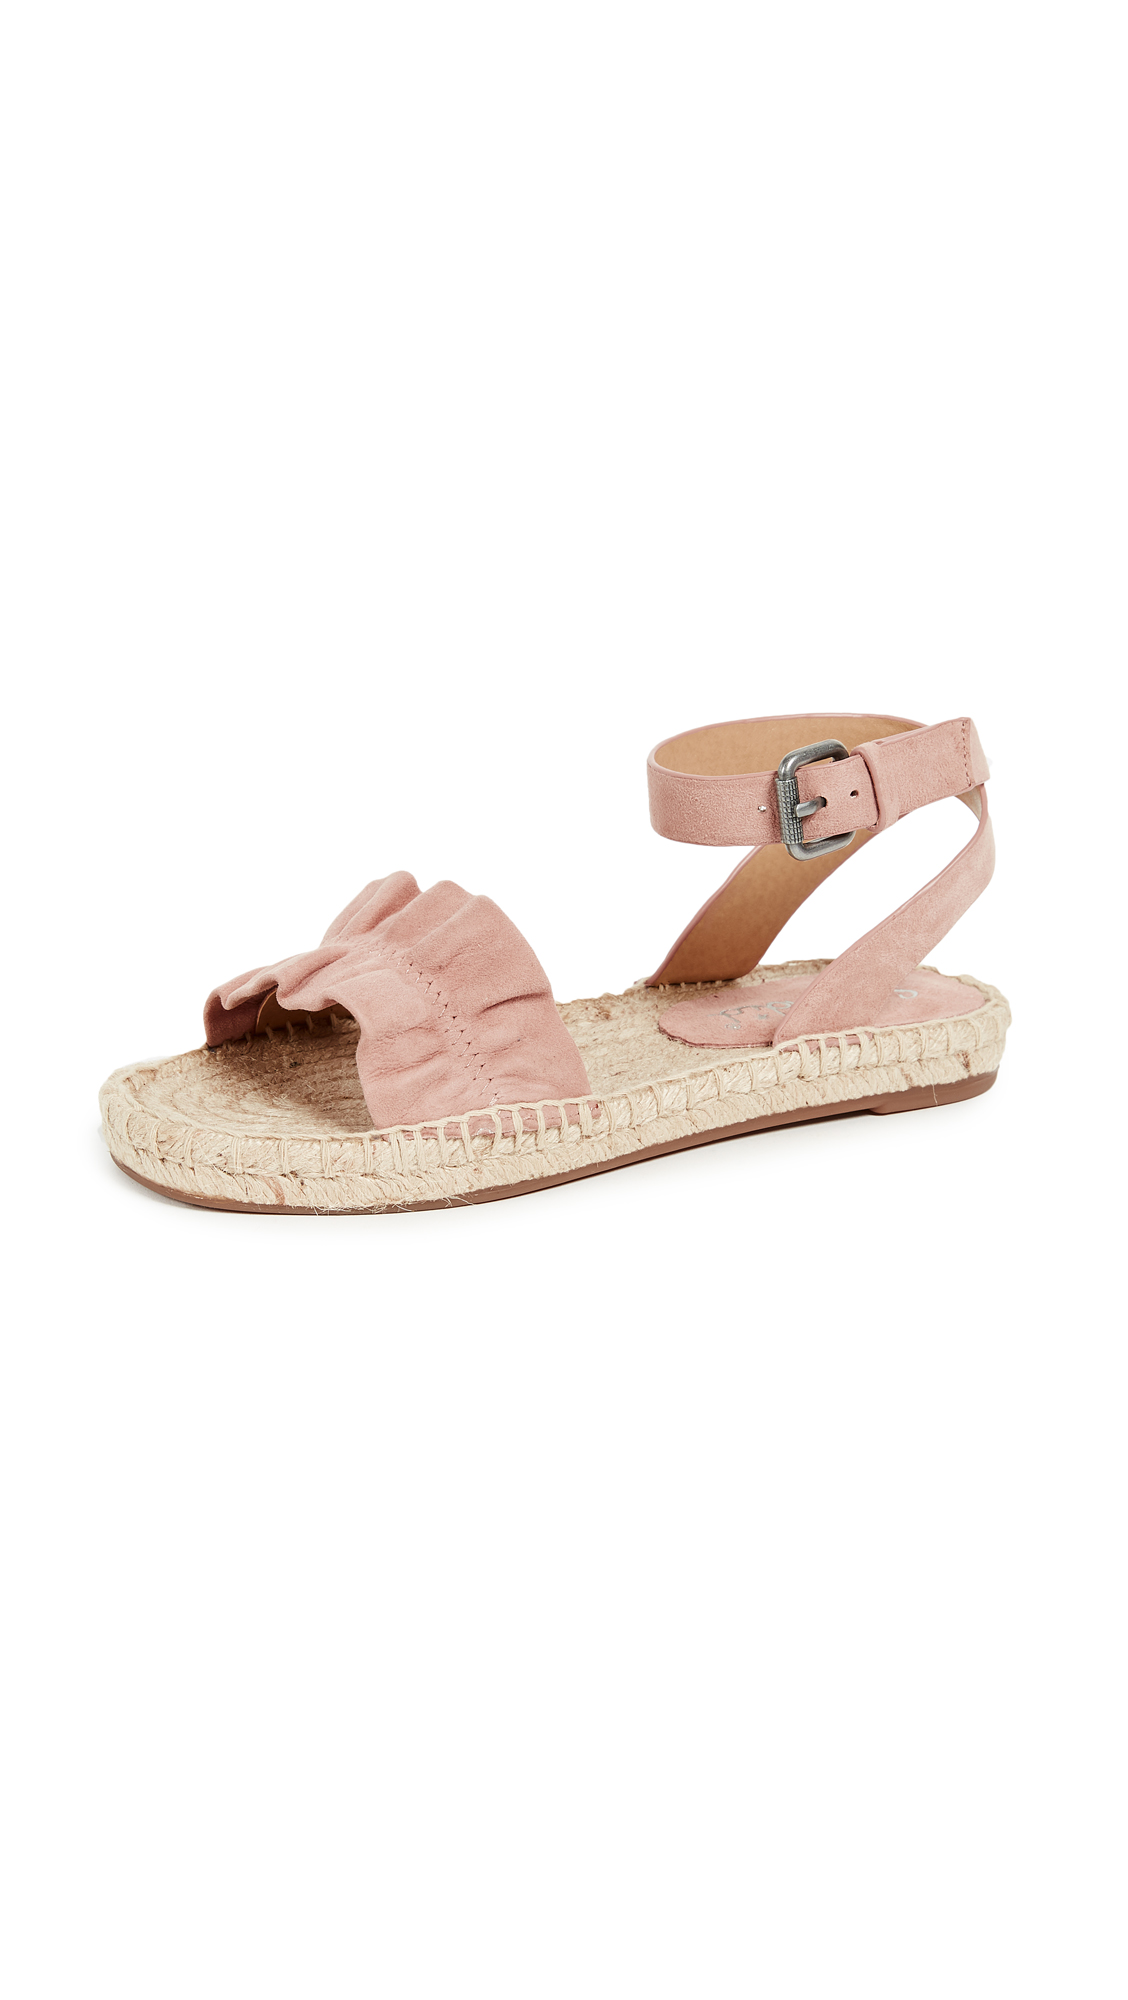 Splendid Becca Ankle Strap Espadrilles - Dark Blush